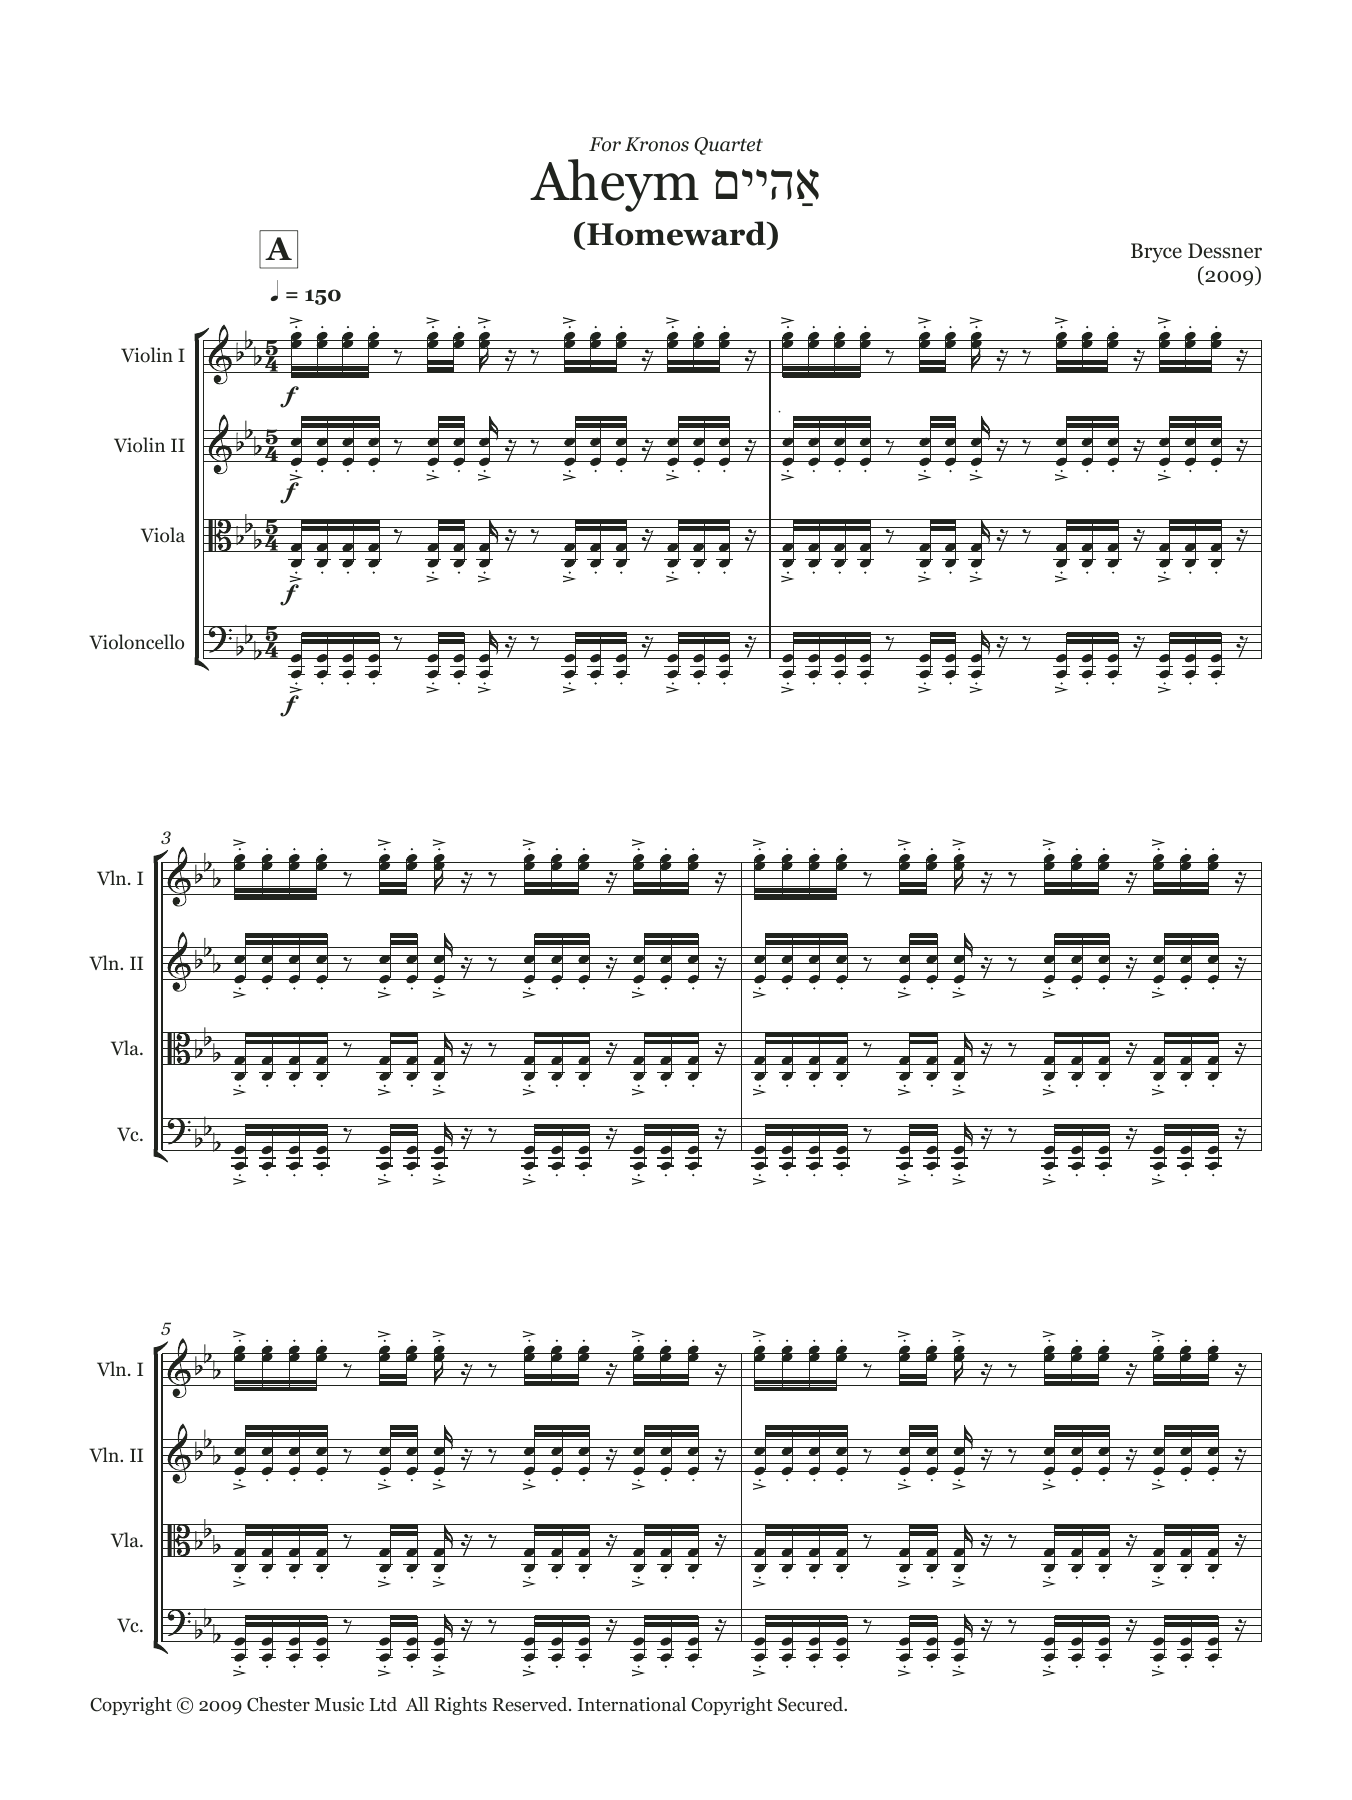 Bryce Dessner - Aheym (String quartet score & parts)